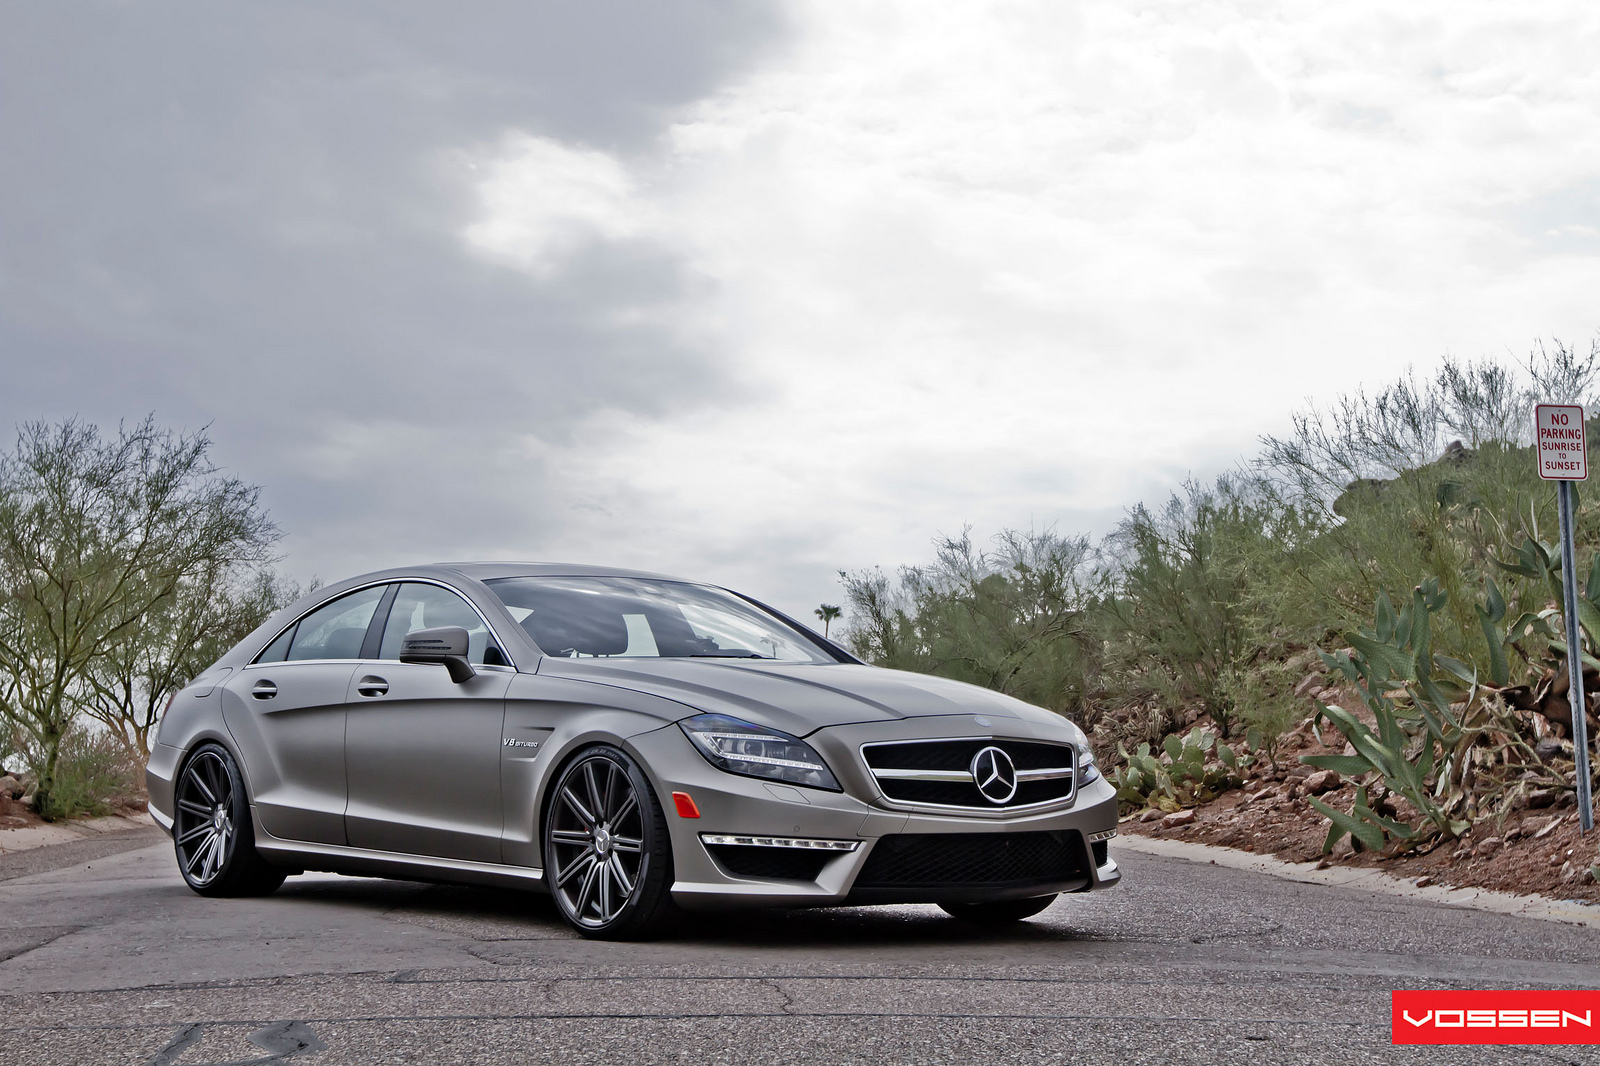 Mercedes cls63 amg on vossen 20 inch rims autoevolution for Mercedes benz 20 inch rims